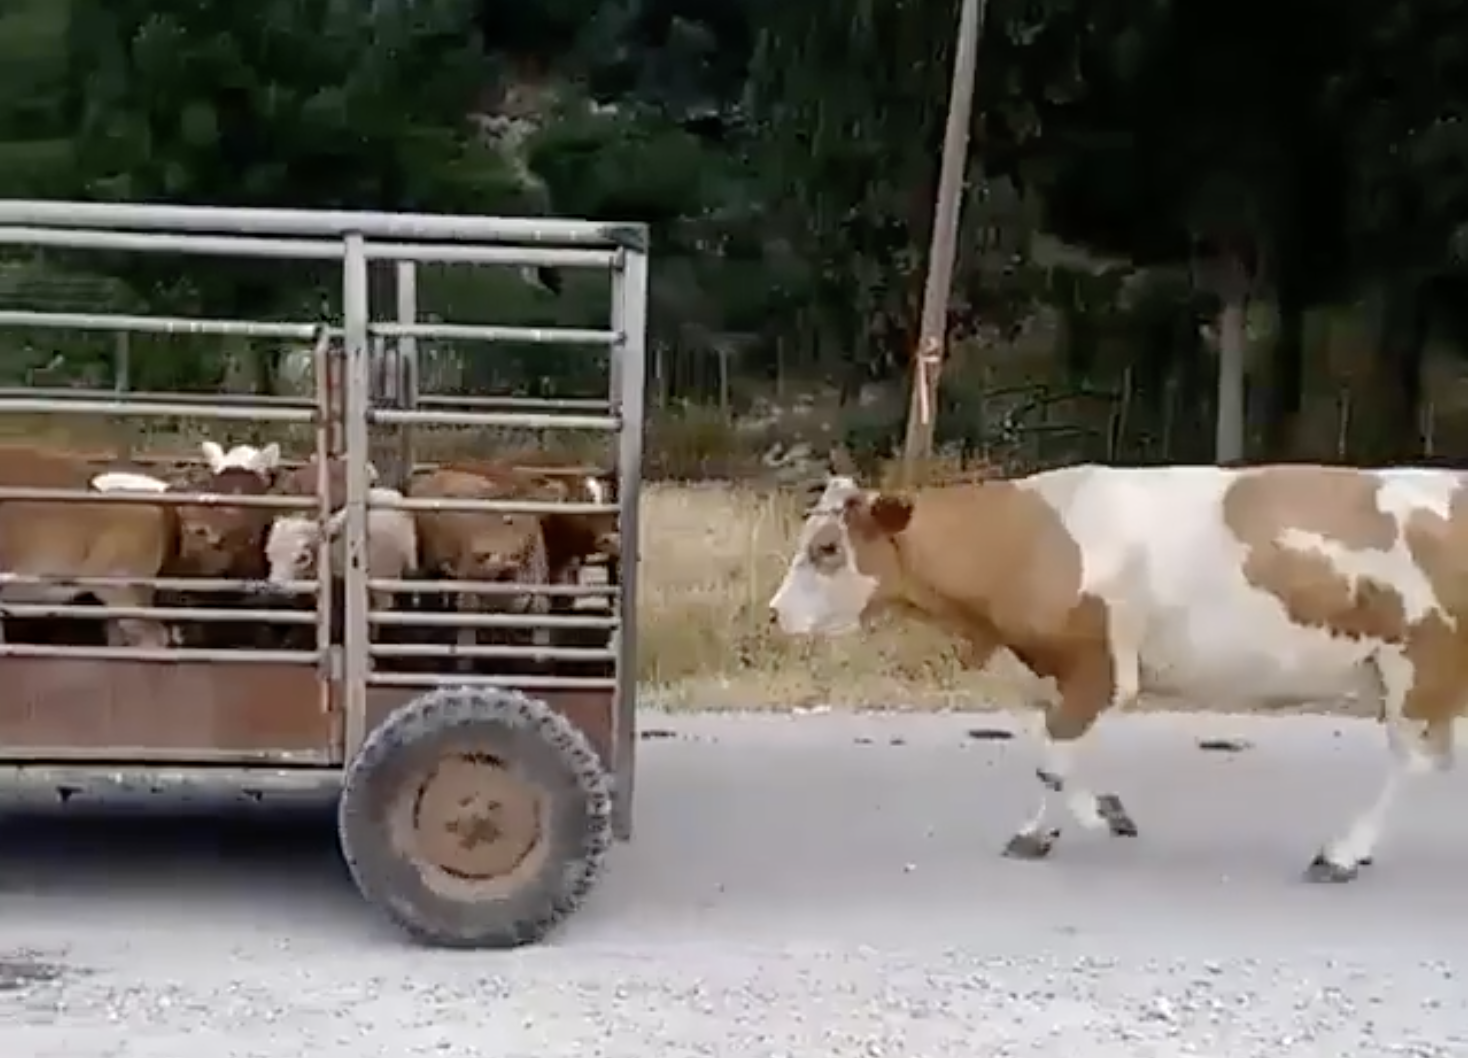 DAIRY COW FOLLOWS BABIES